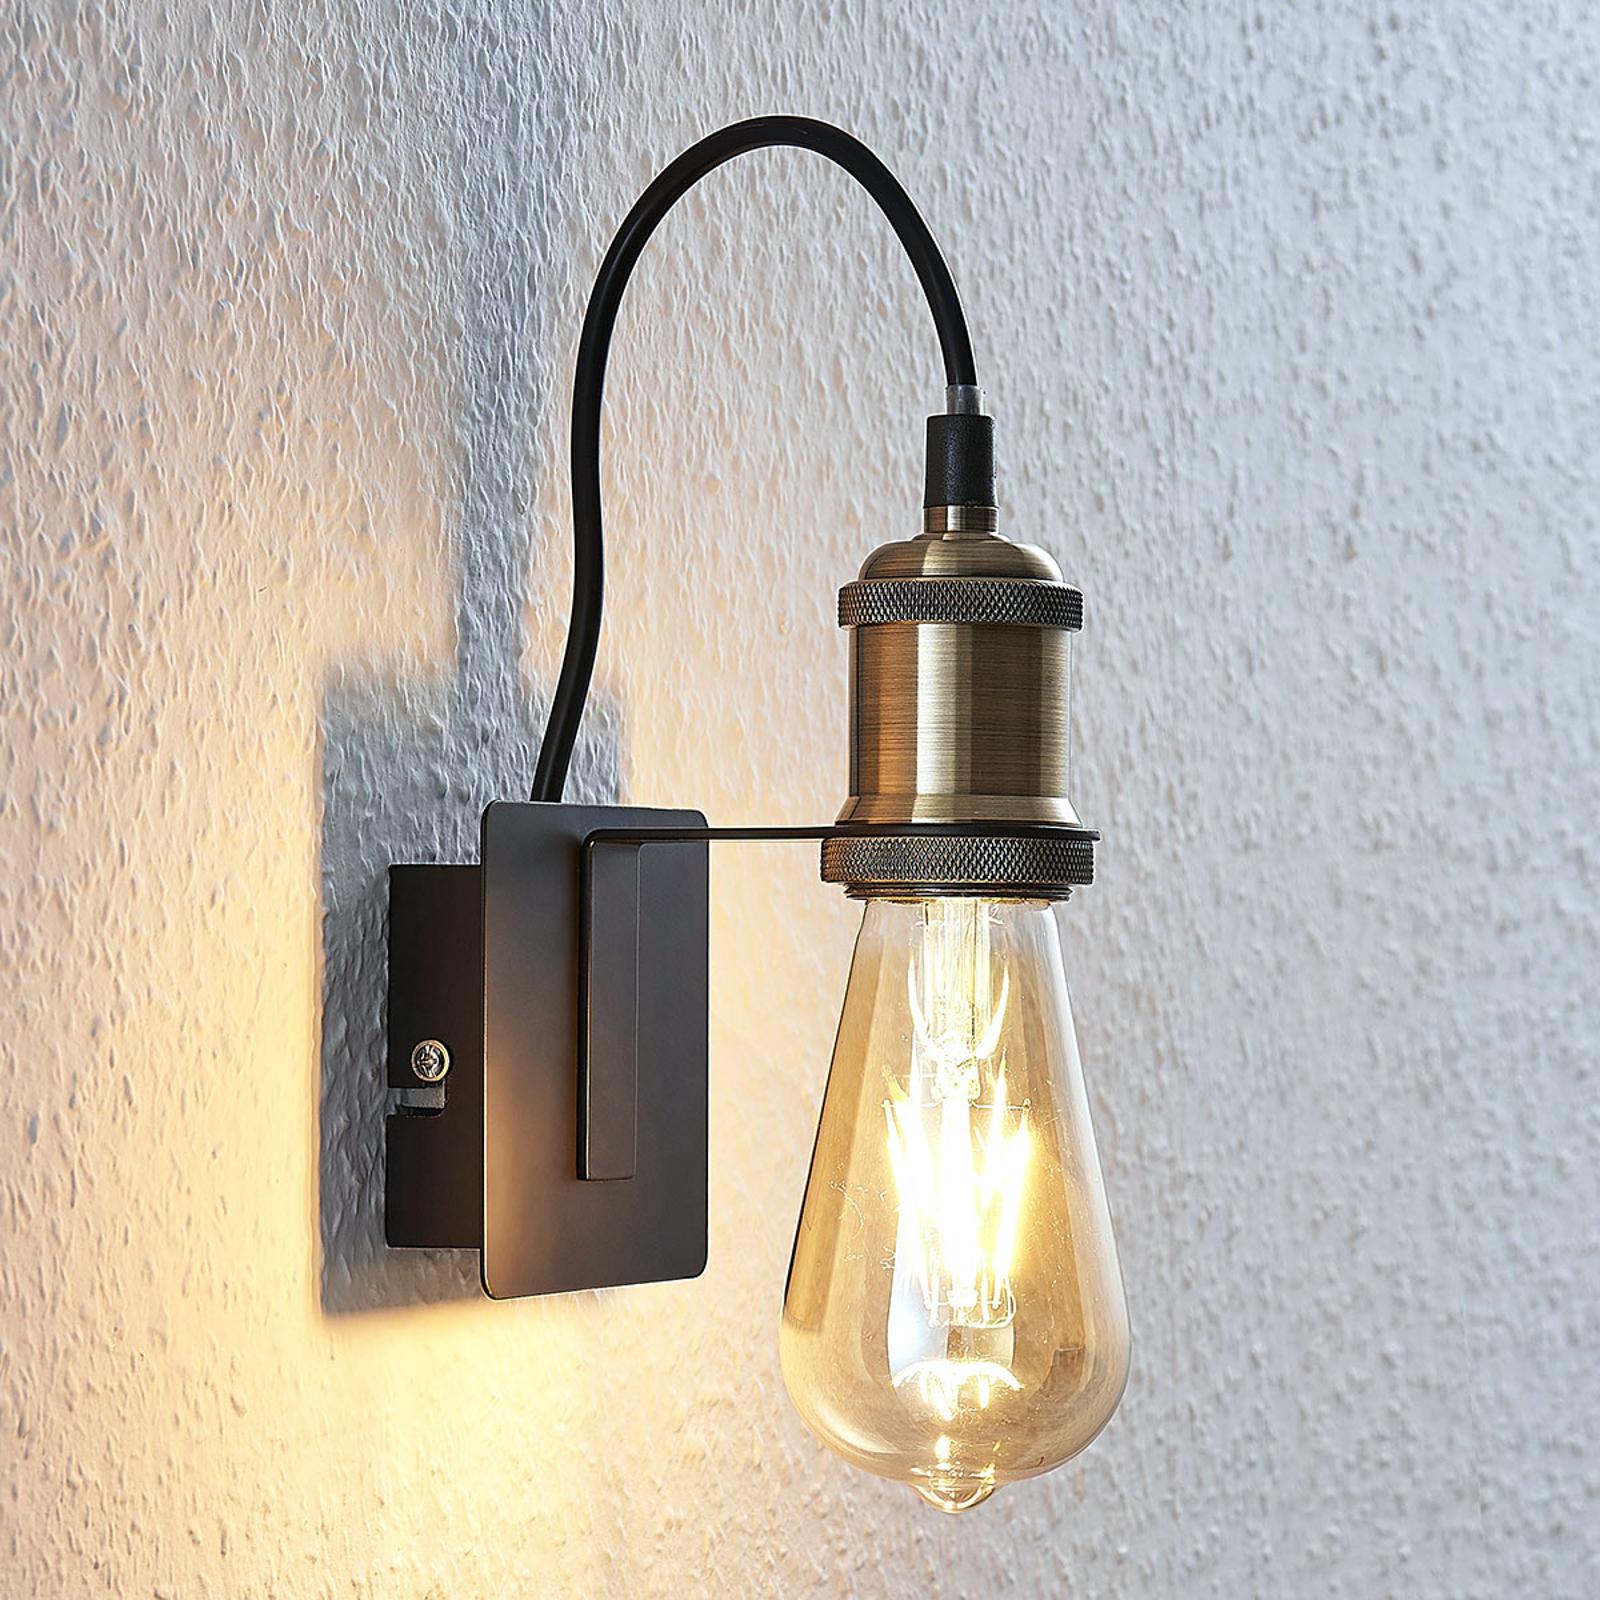 Vintage-væglampe Aurella, antik messing